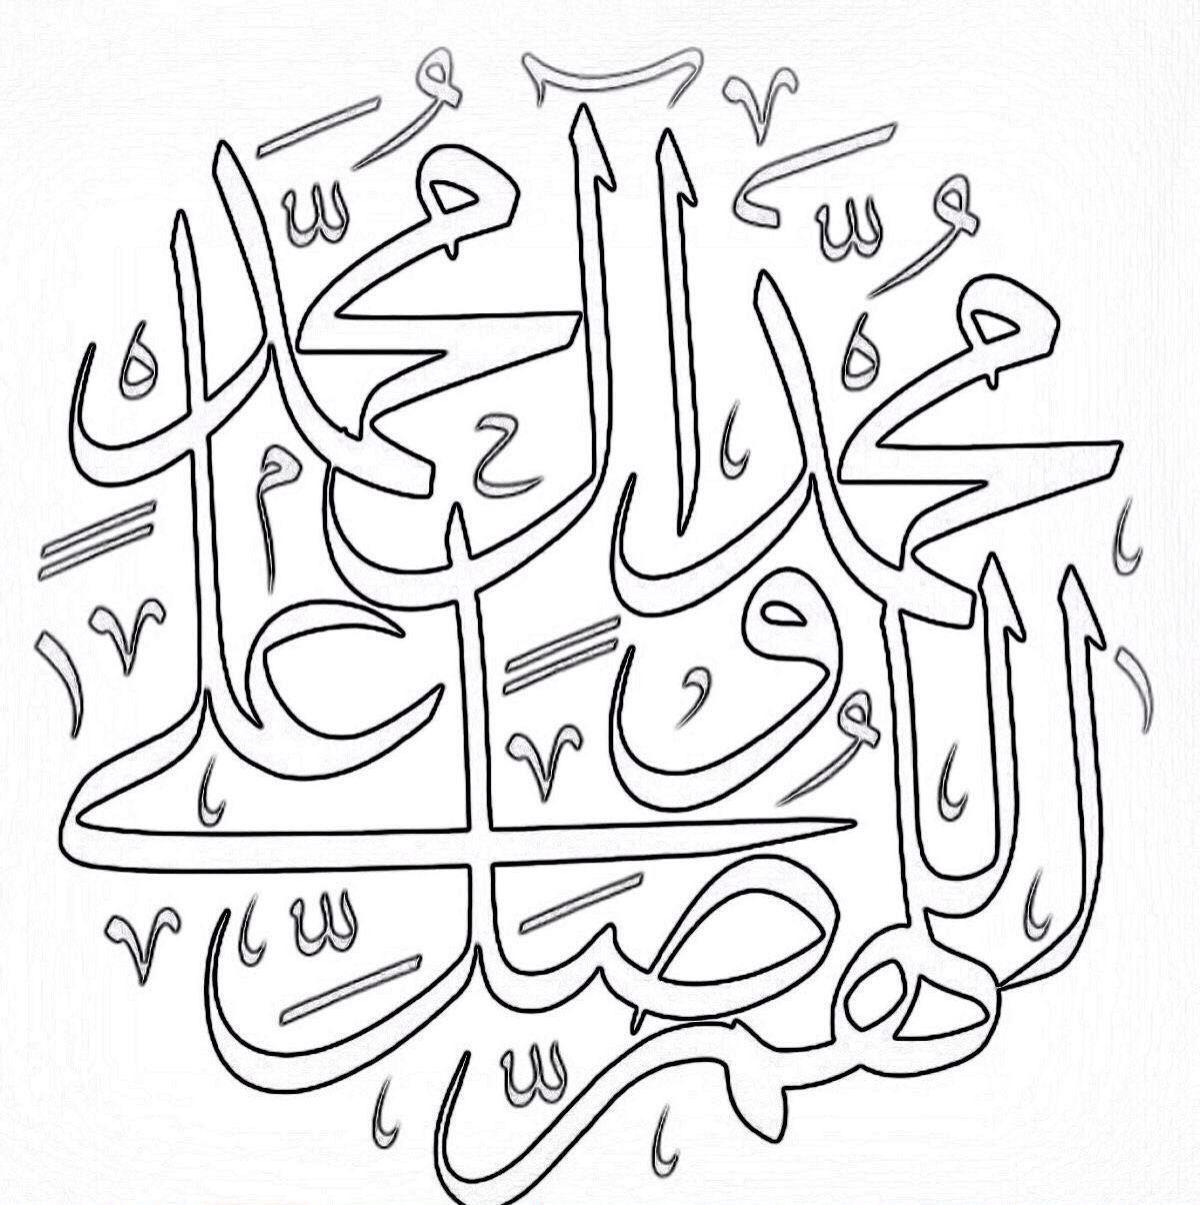 Islami sanat, اللهم صل على محمد وآل محمد٢ panosunda زهرة